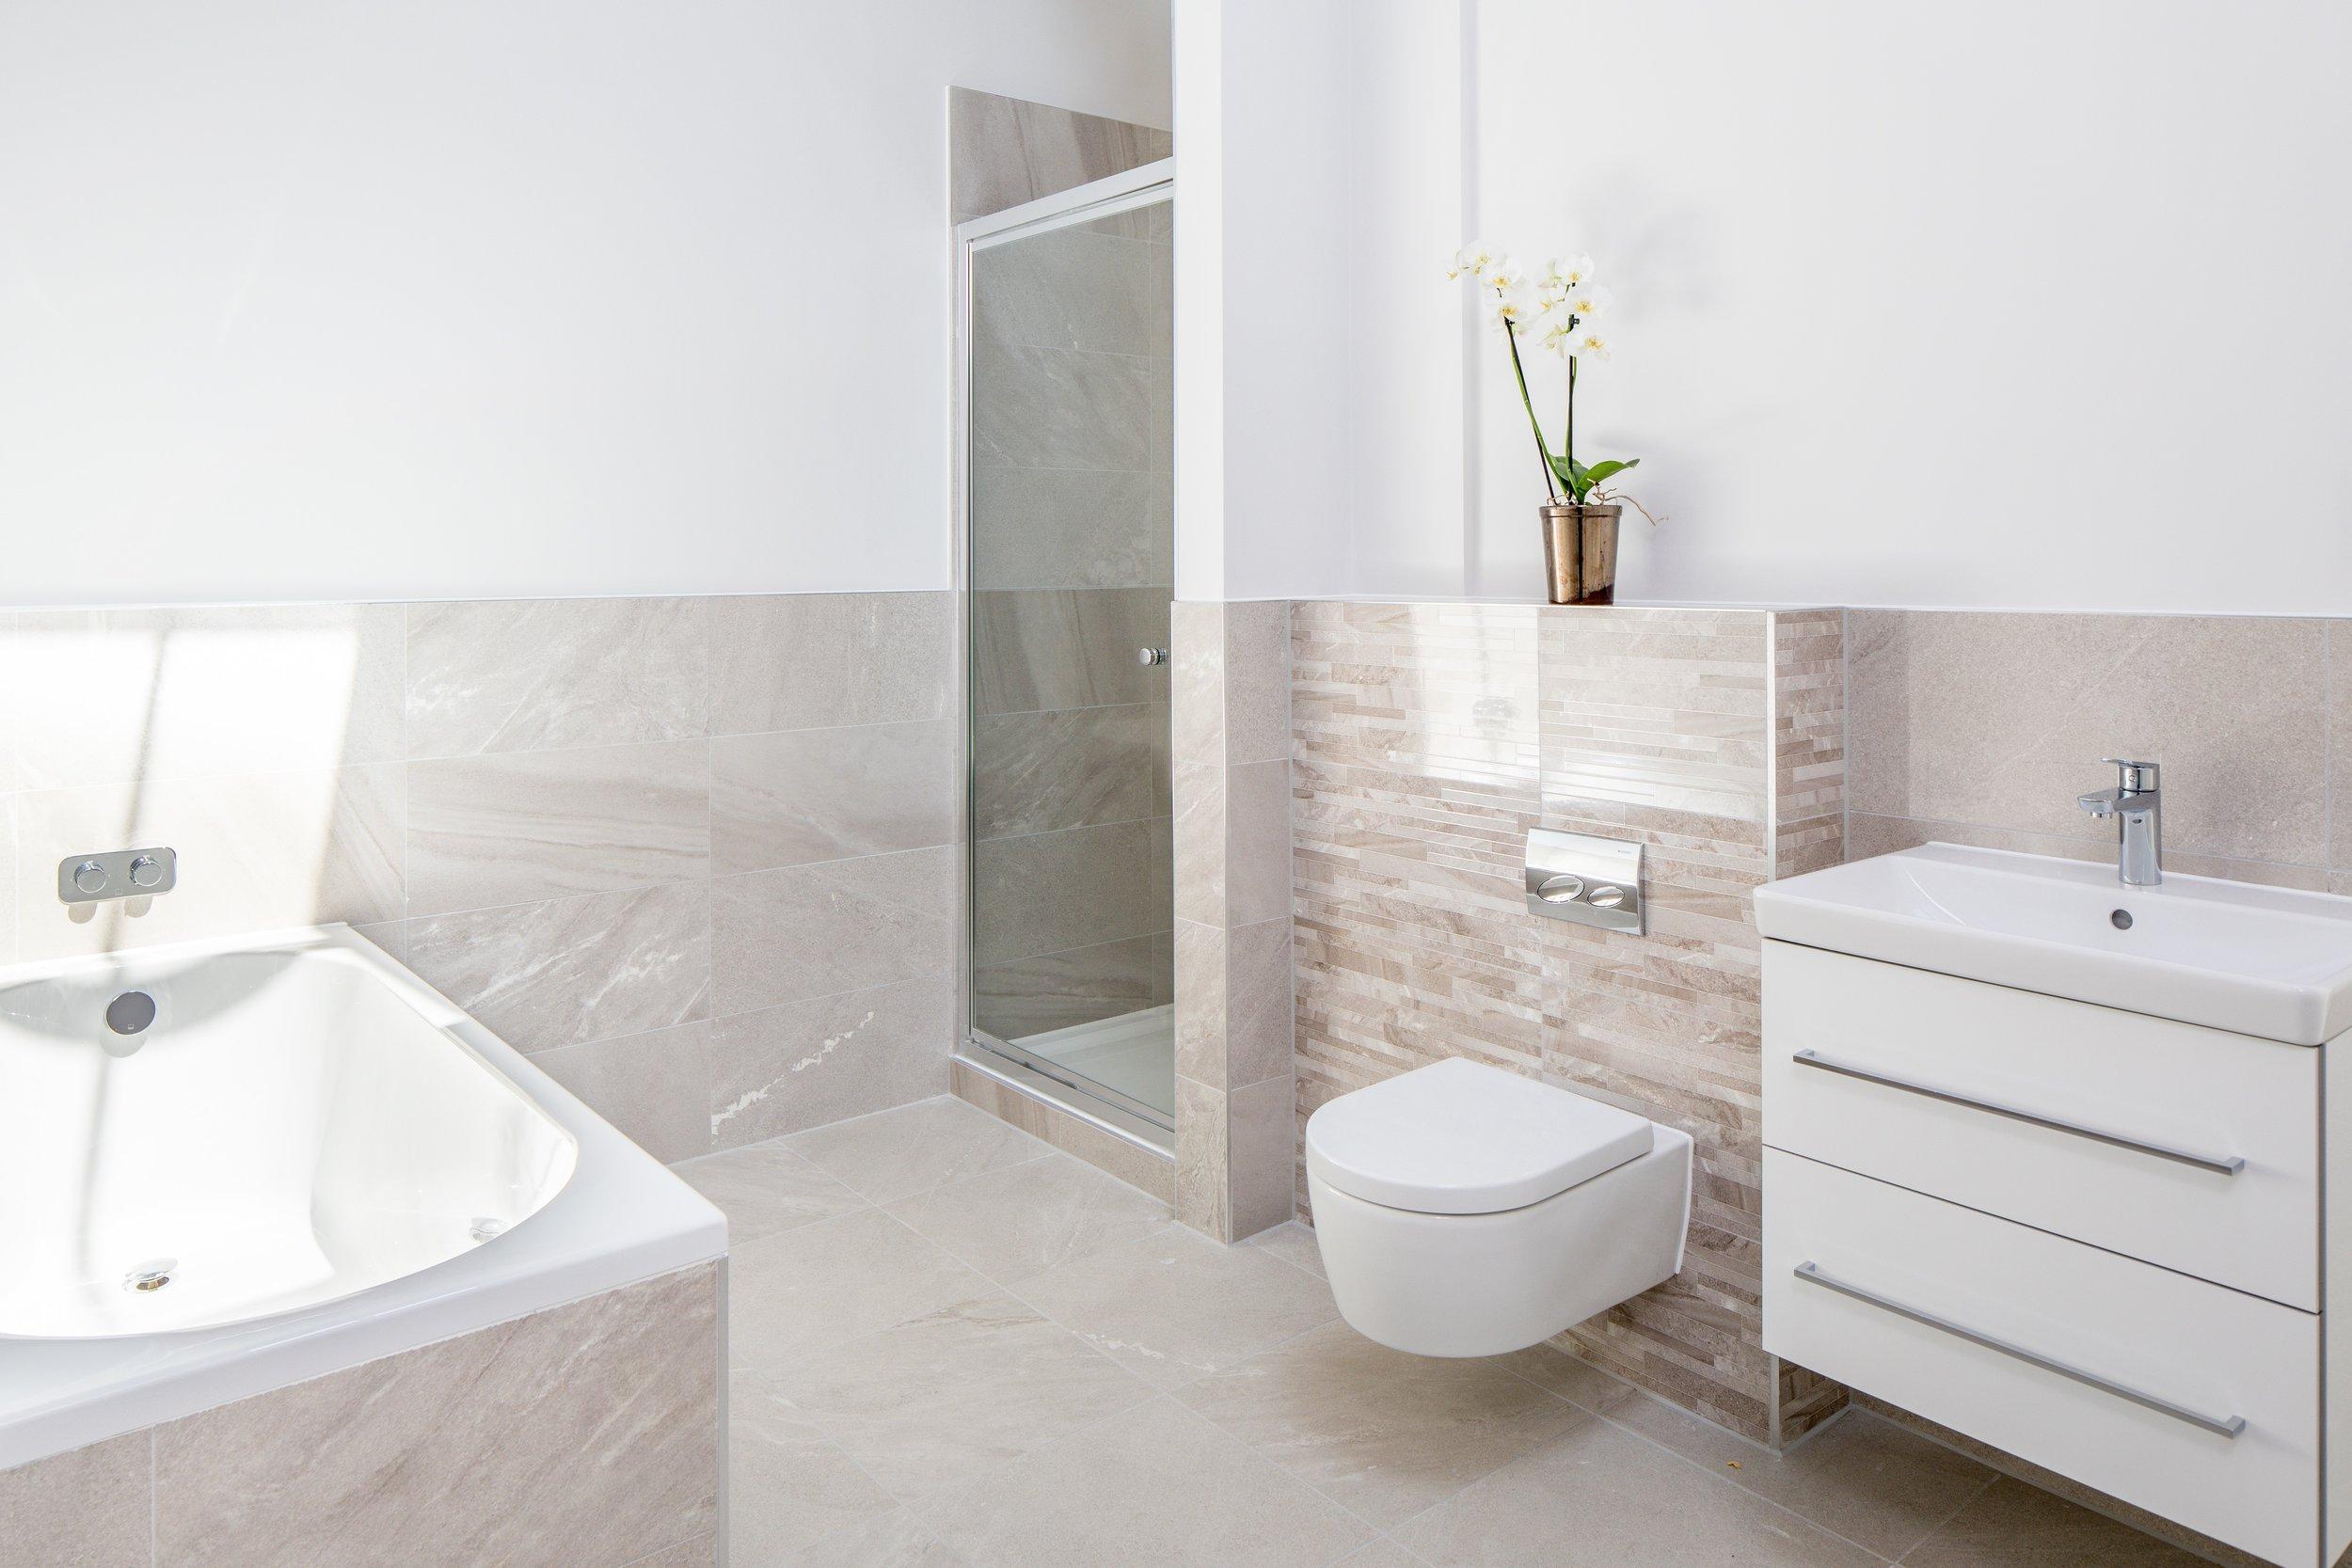 _Z1A4303-Edit C bathroom.jpg